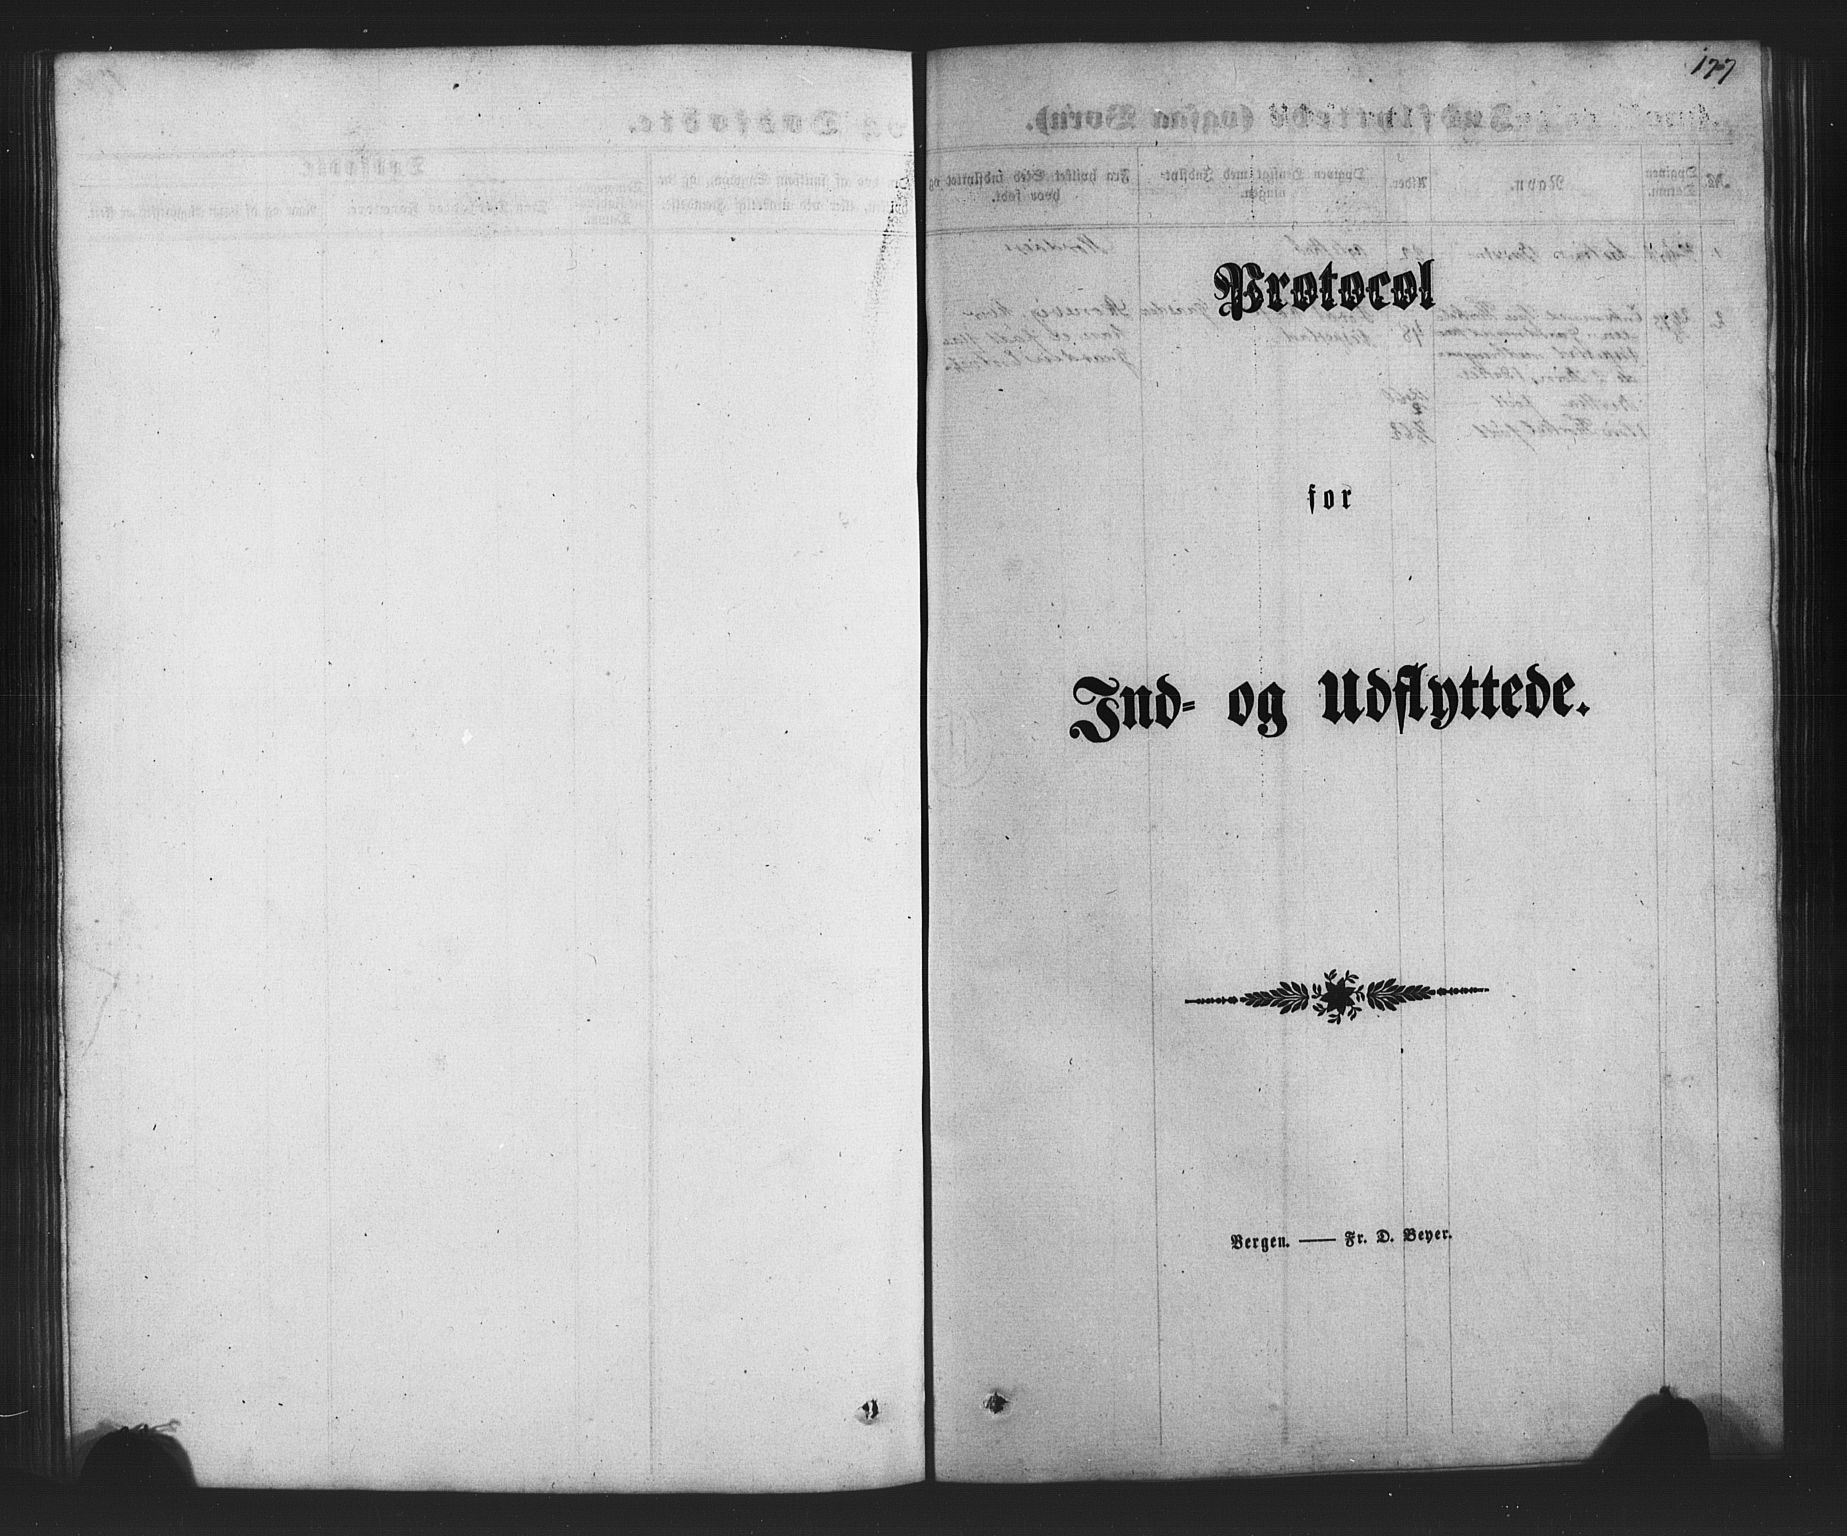 SAB, Finnås sokneprestembete, H/Ha/Hab/Habc/L0001: Klokkerbok nr. C 1, 1860-1887, s. 177